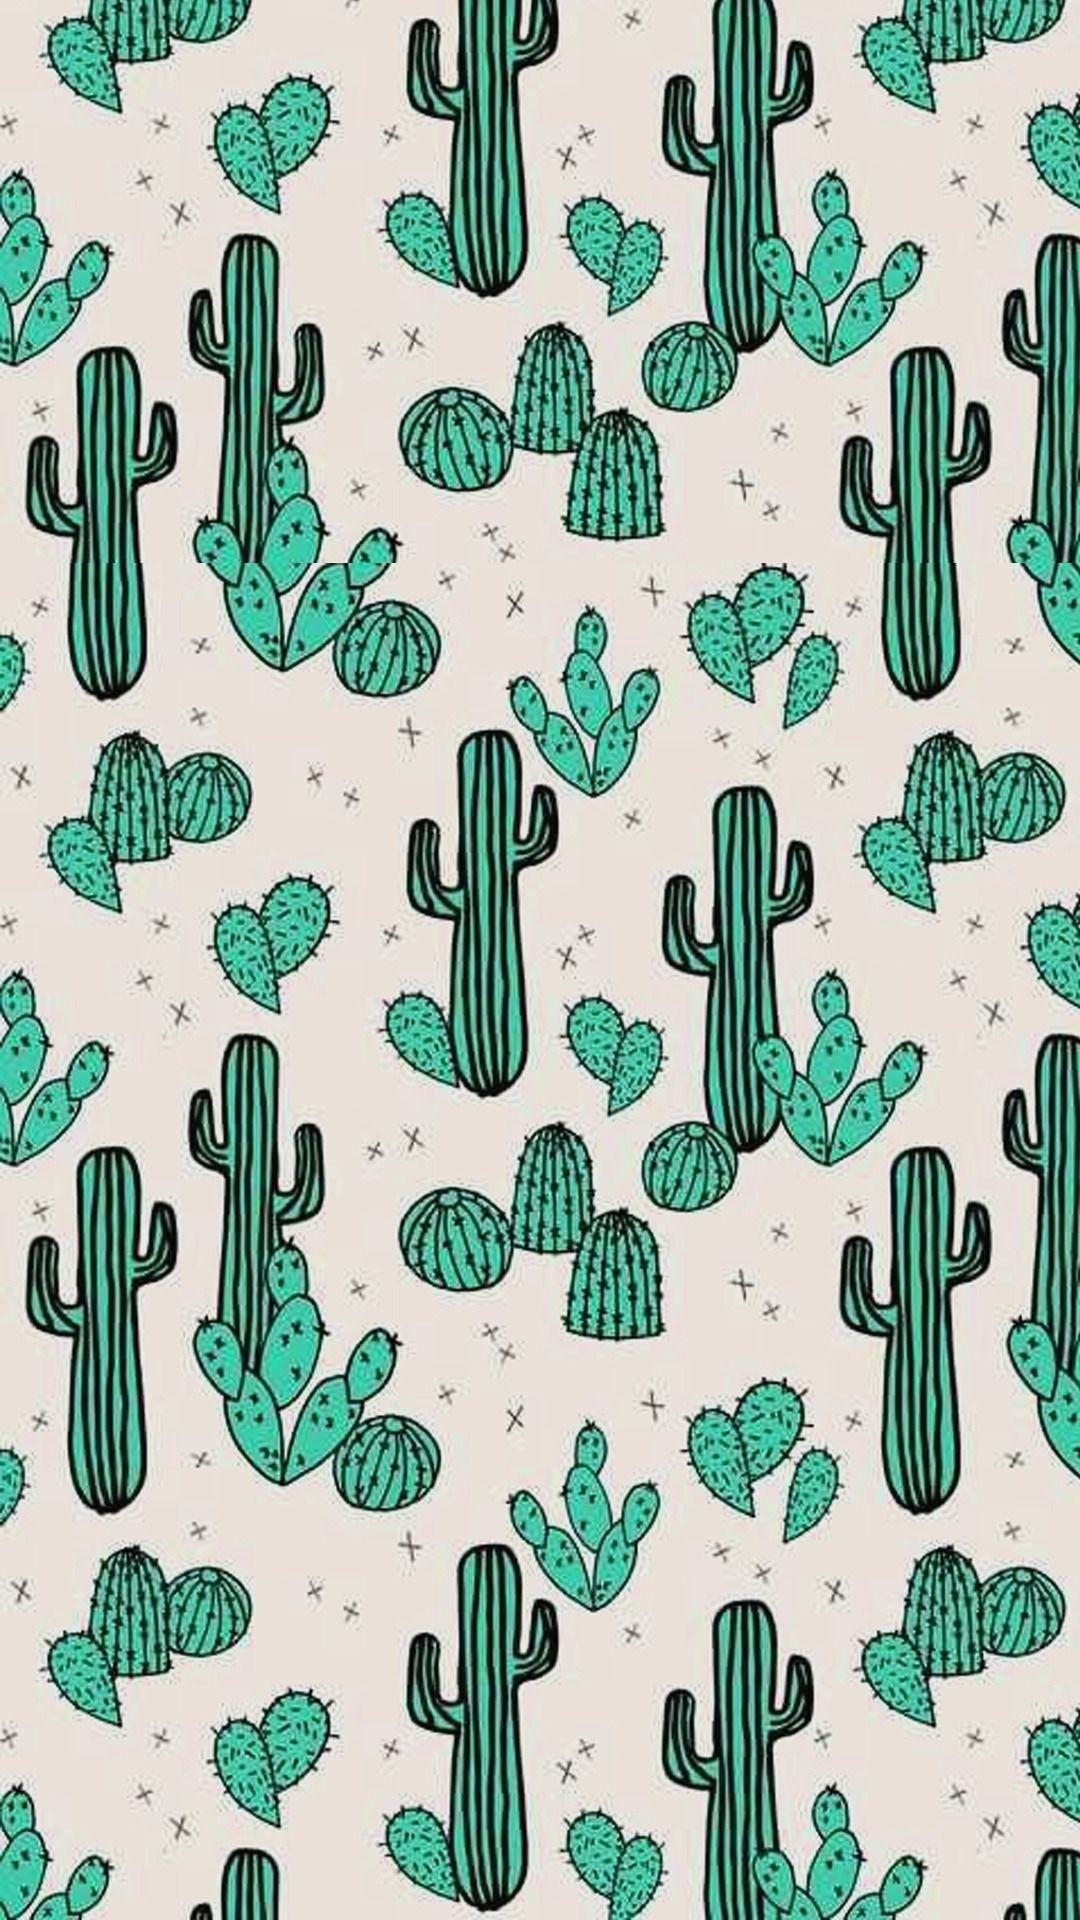 Cactus iphone 6 wallpaper